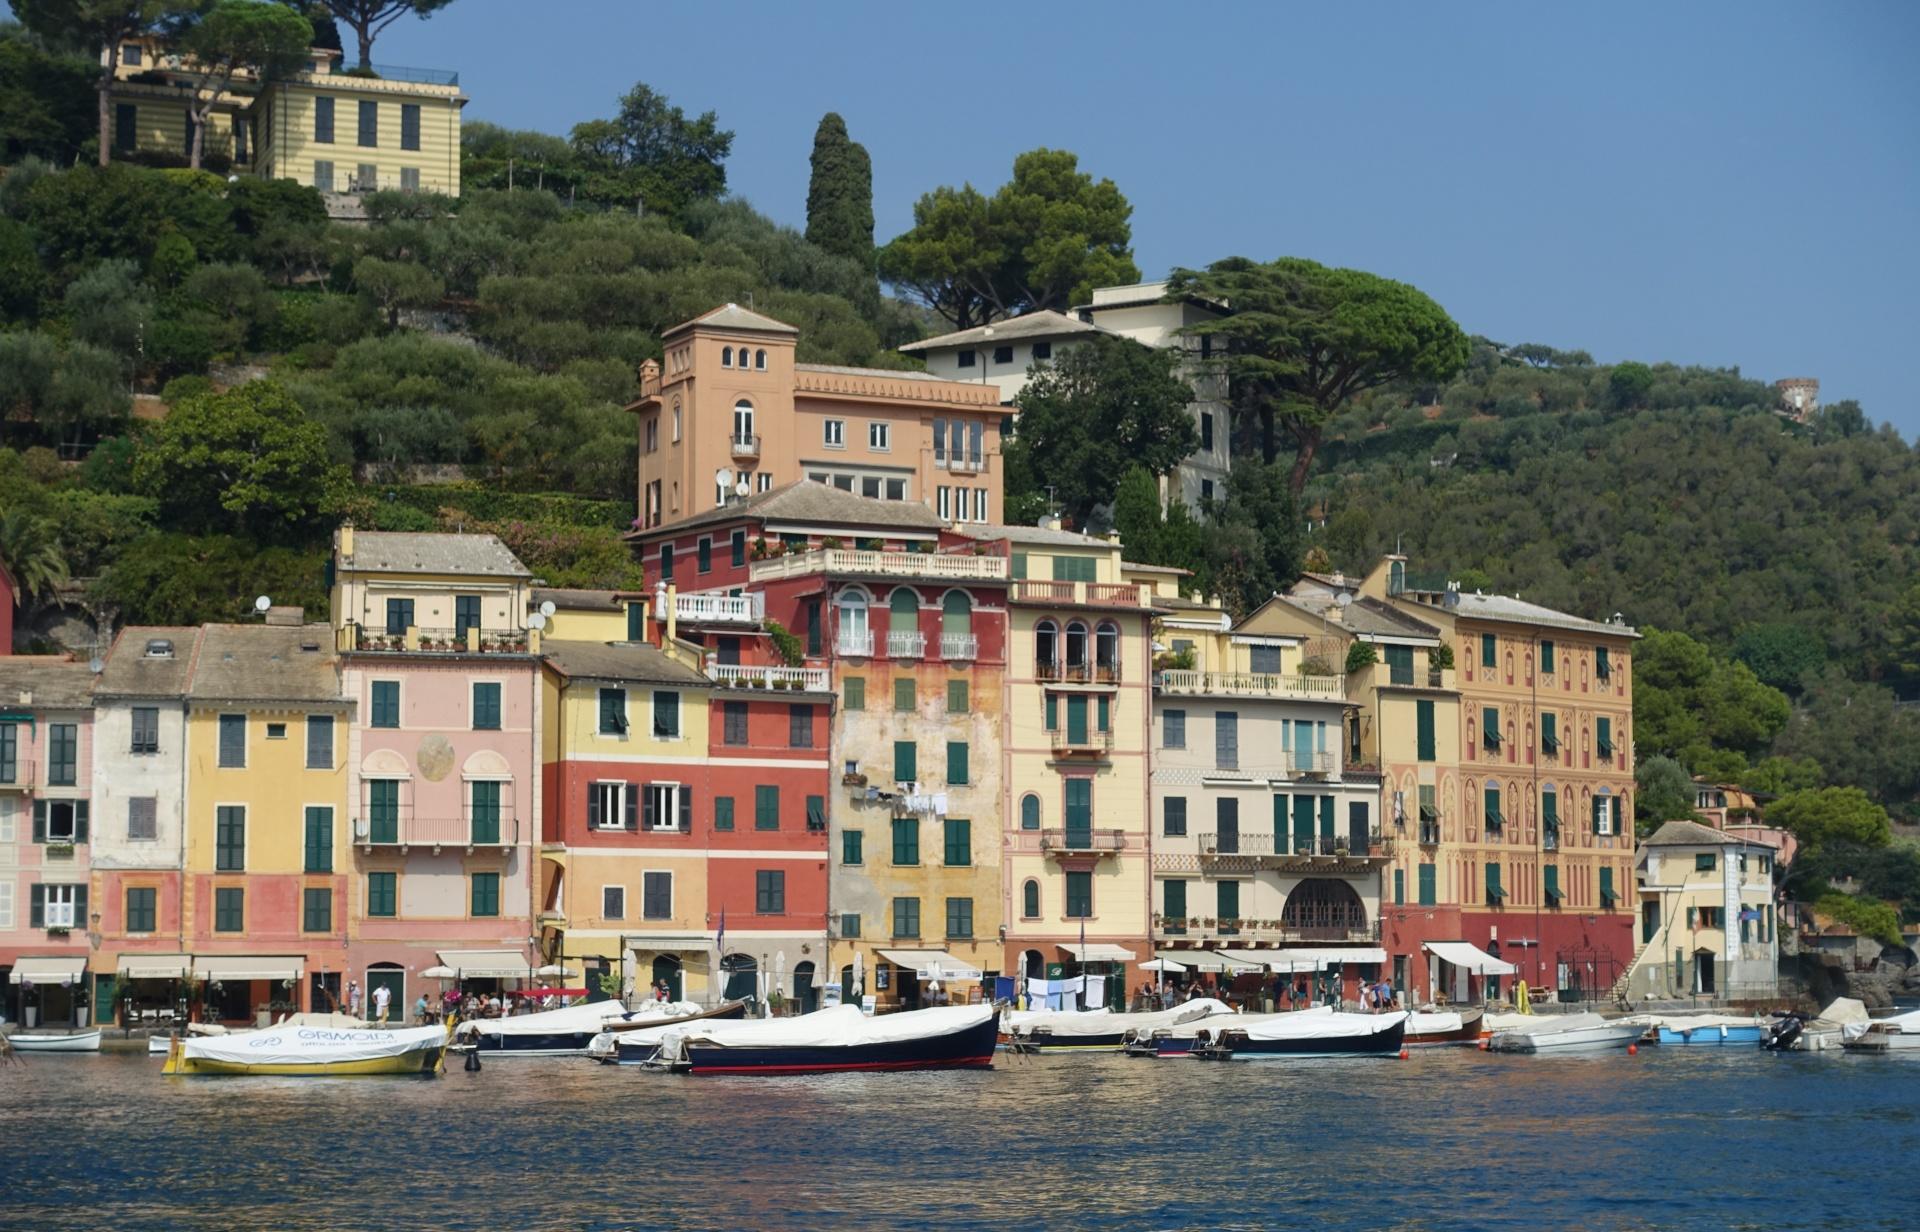 Waterfront Houses of Portofino